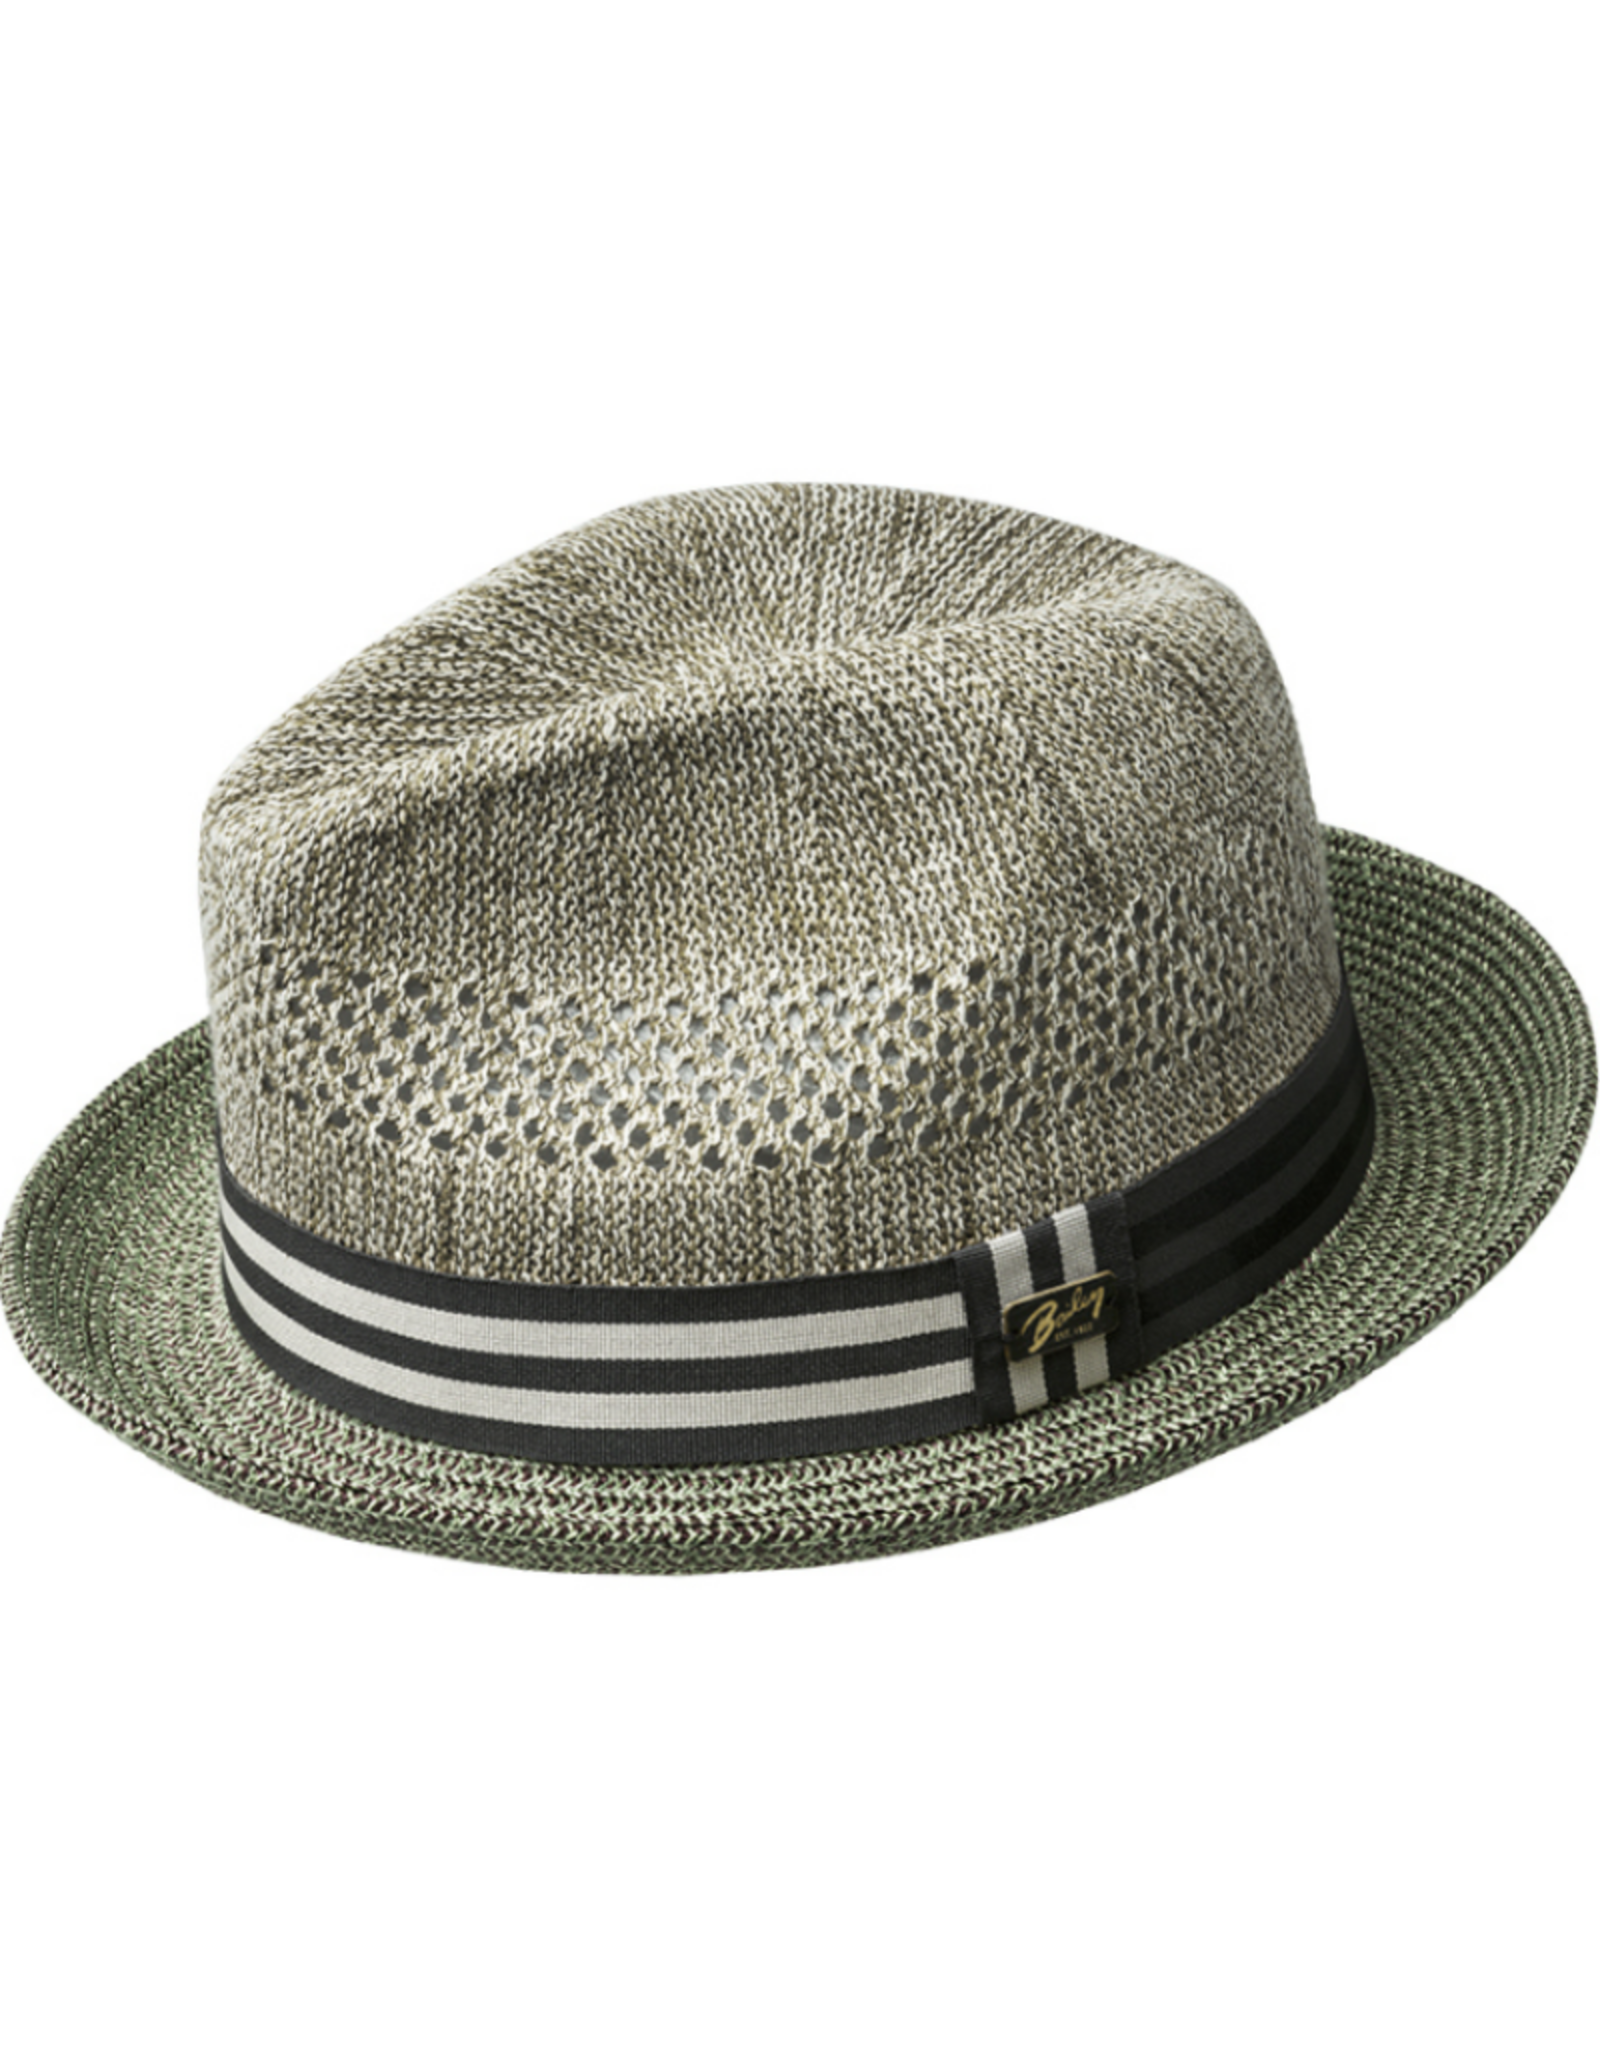 "Bailey Hat Co. HAT-FEDORA  SMALL BRIM ""BERLE"", STRAW W STRIPED BAND"